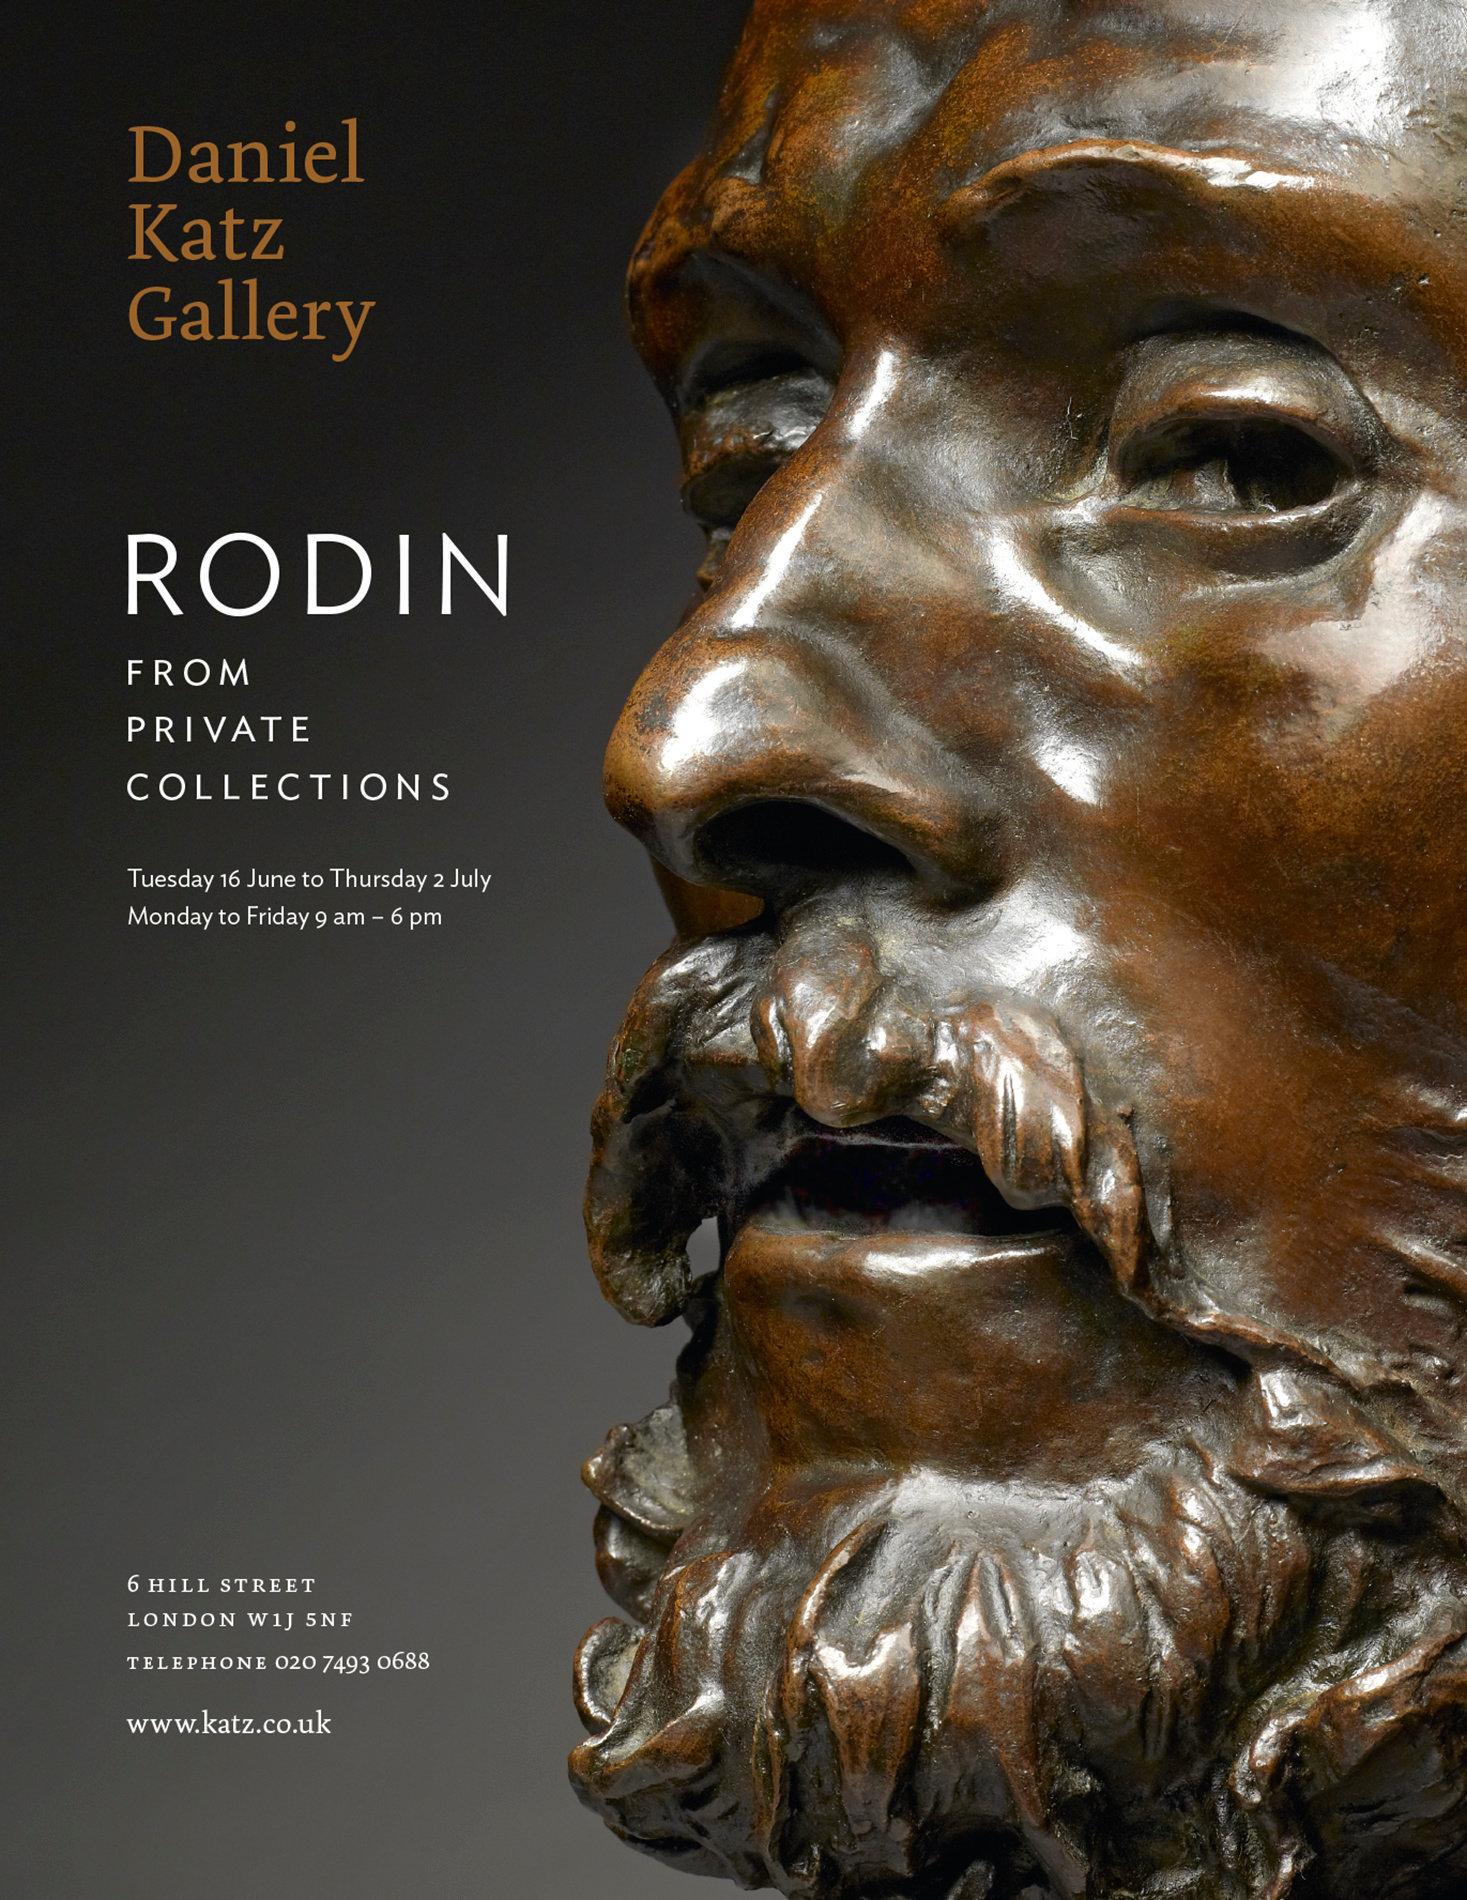 Daniel Katz Gallery - Rodin